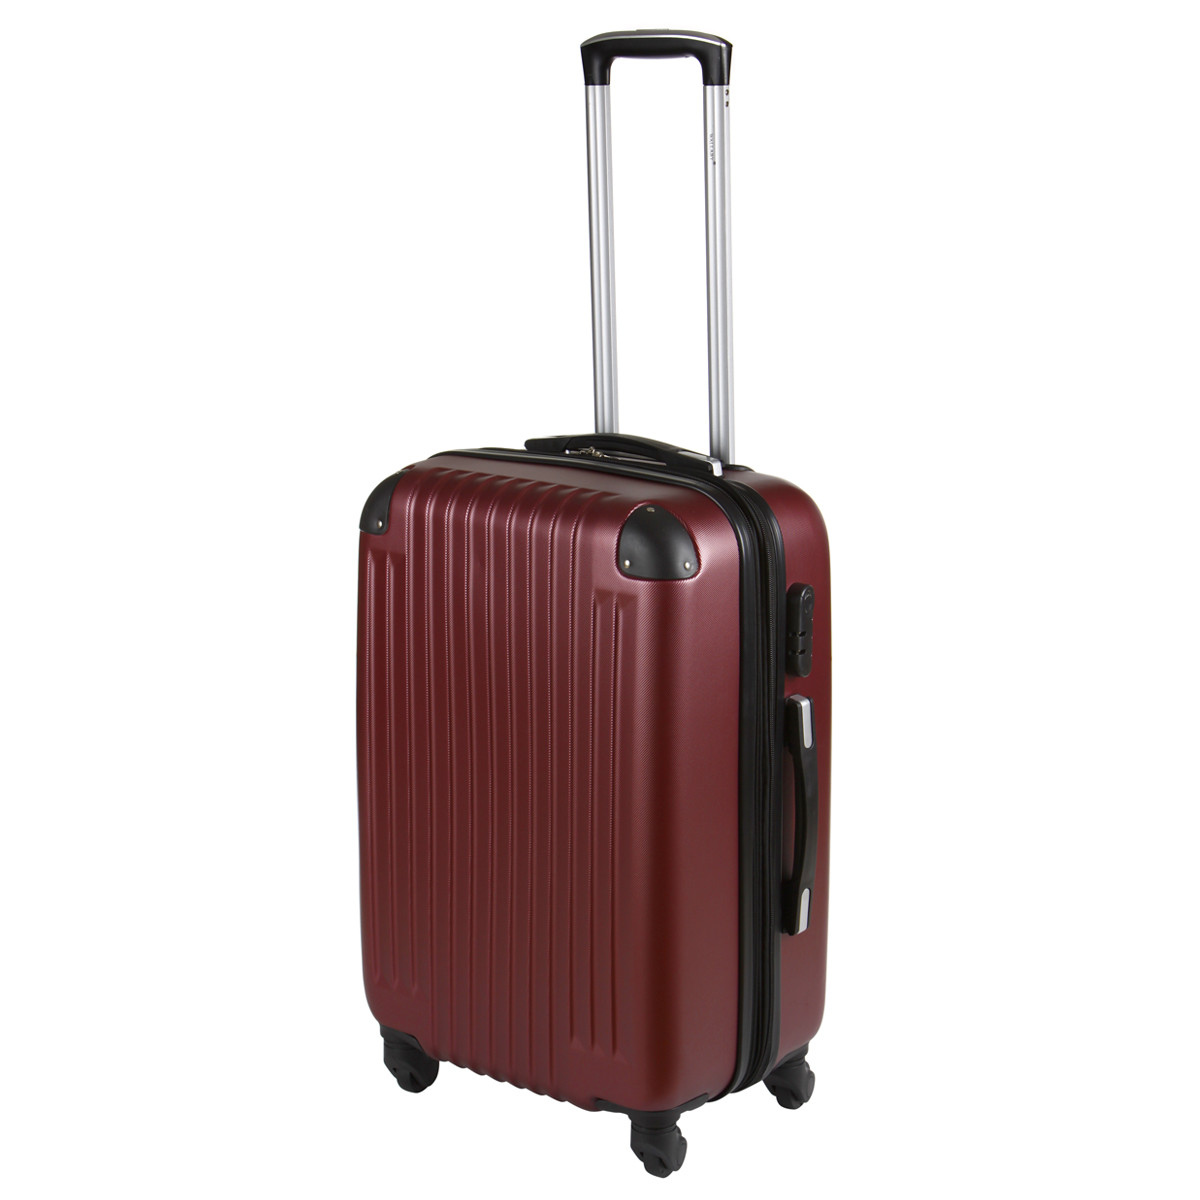 Чемодан Wallaby средний пластиковый  ABS  57(+6)х39х27(+3) цвет бордовый  в 6265-22бор